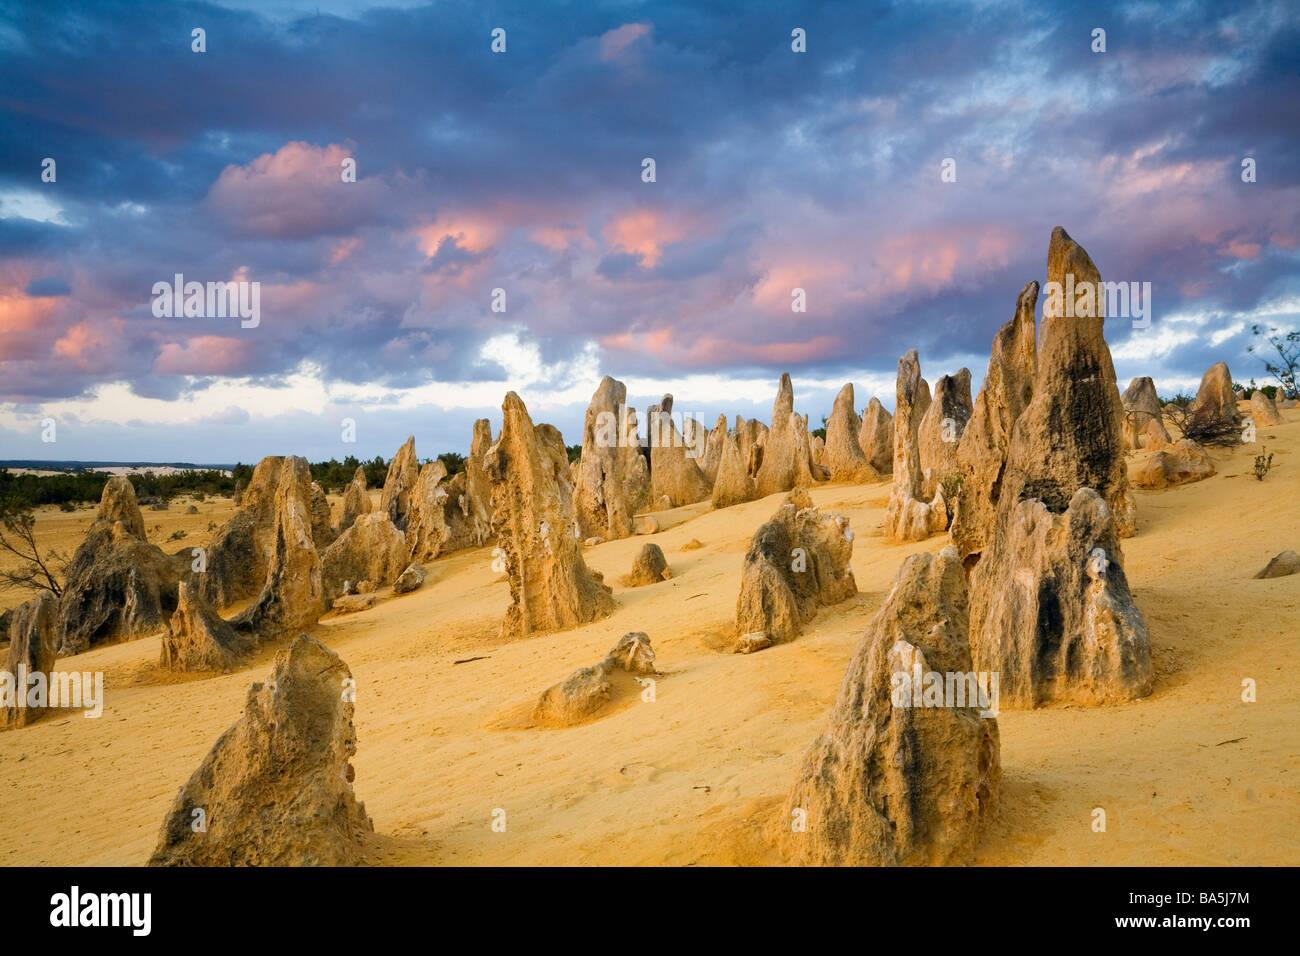 Sunset in the Pinnacles Desert.  Nambung National Park, Cervantes, Western Australia, AUSTRALIA - Stock Image